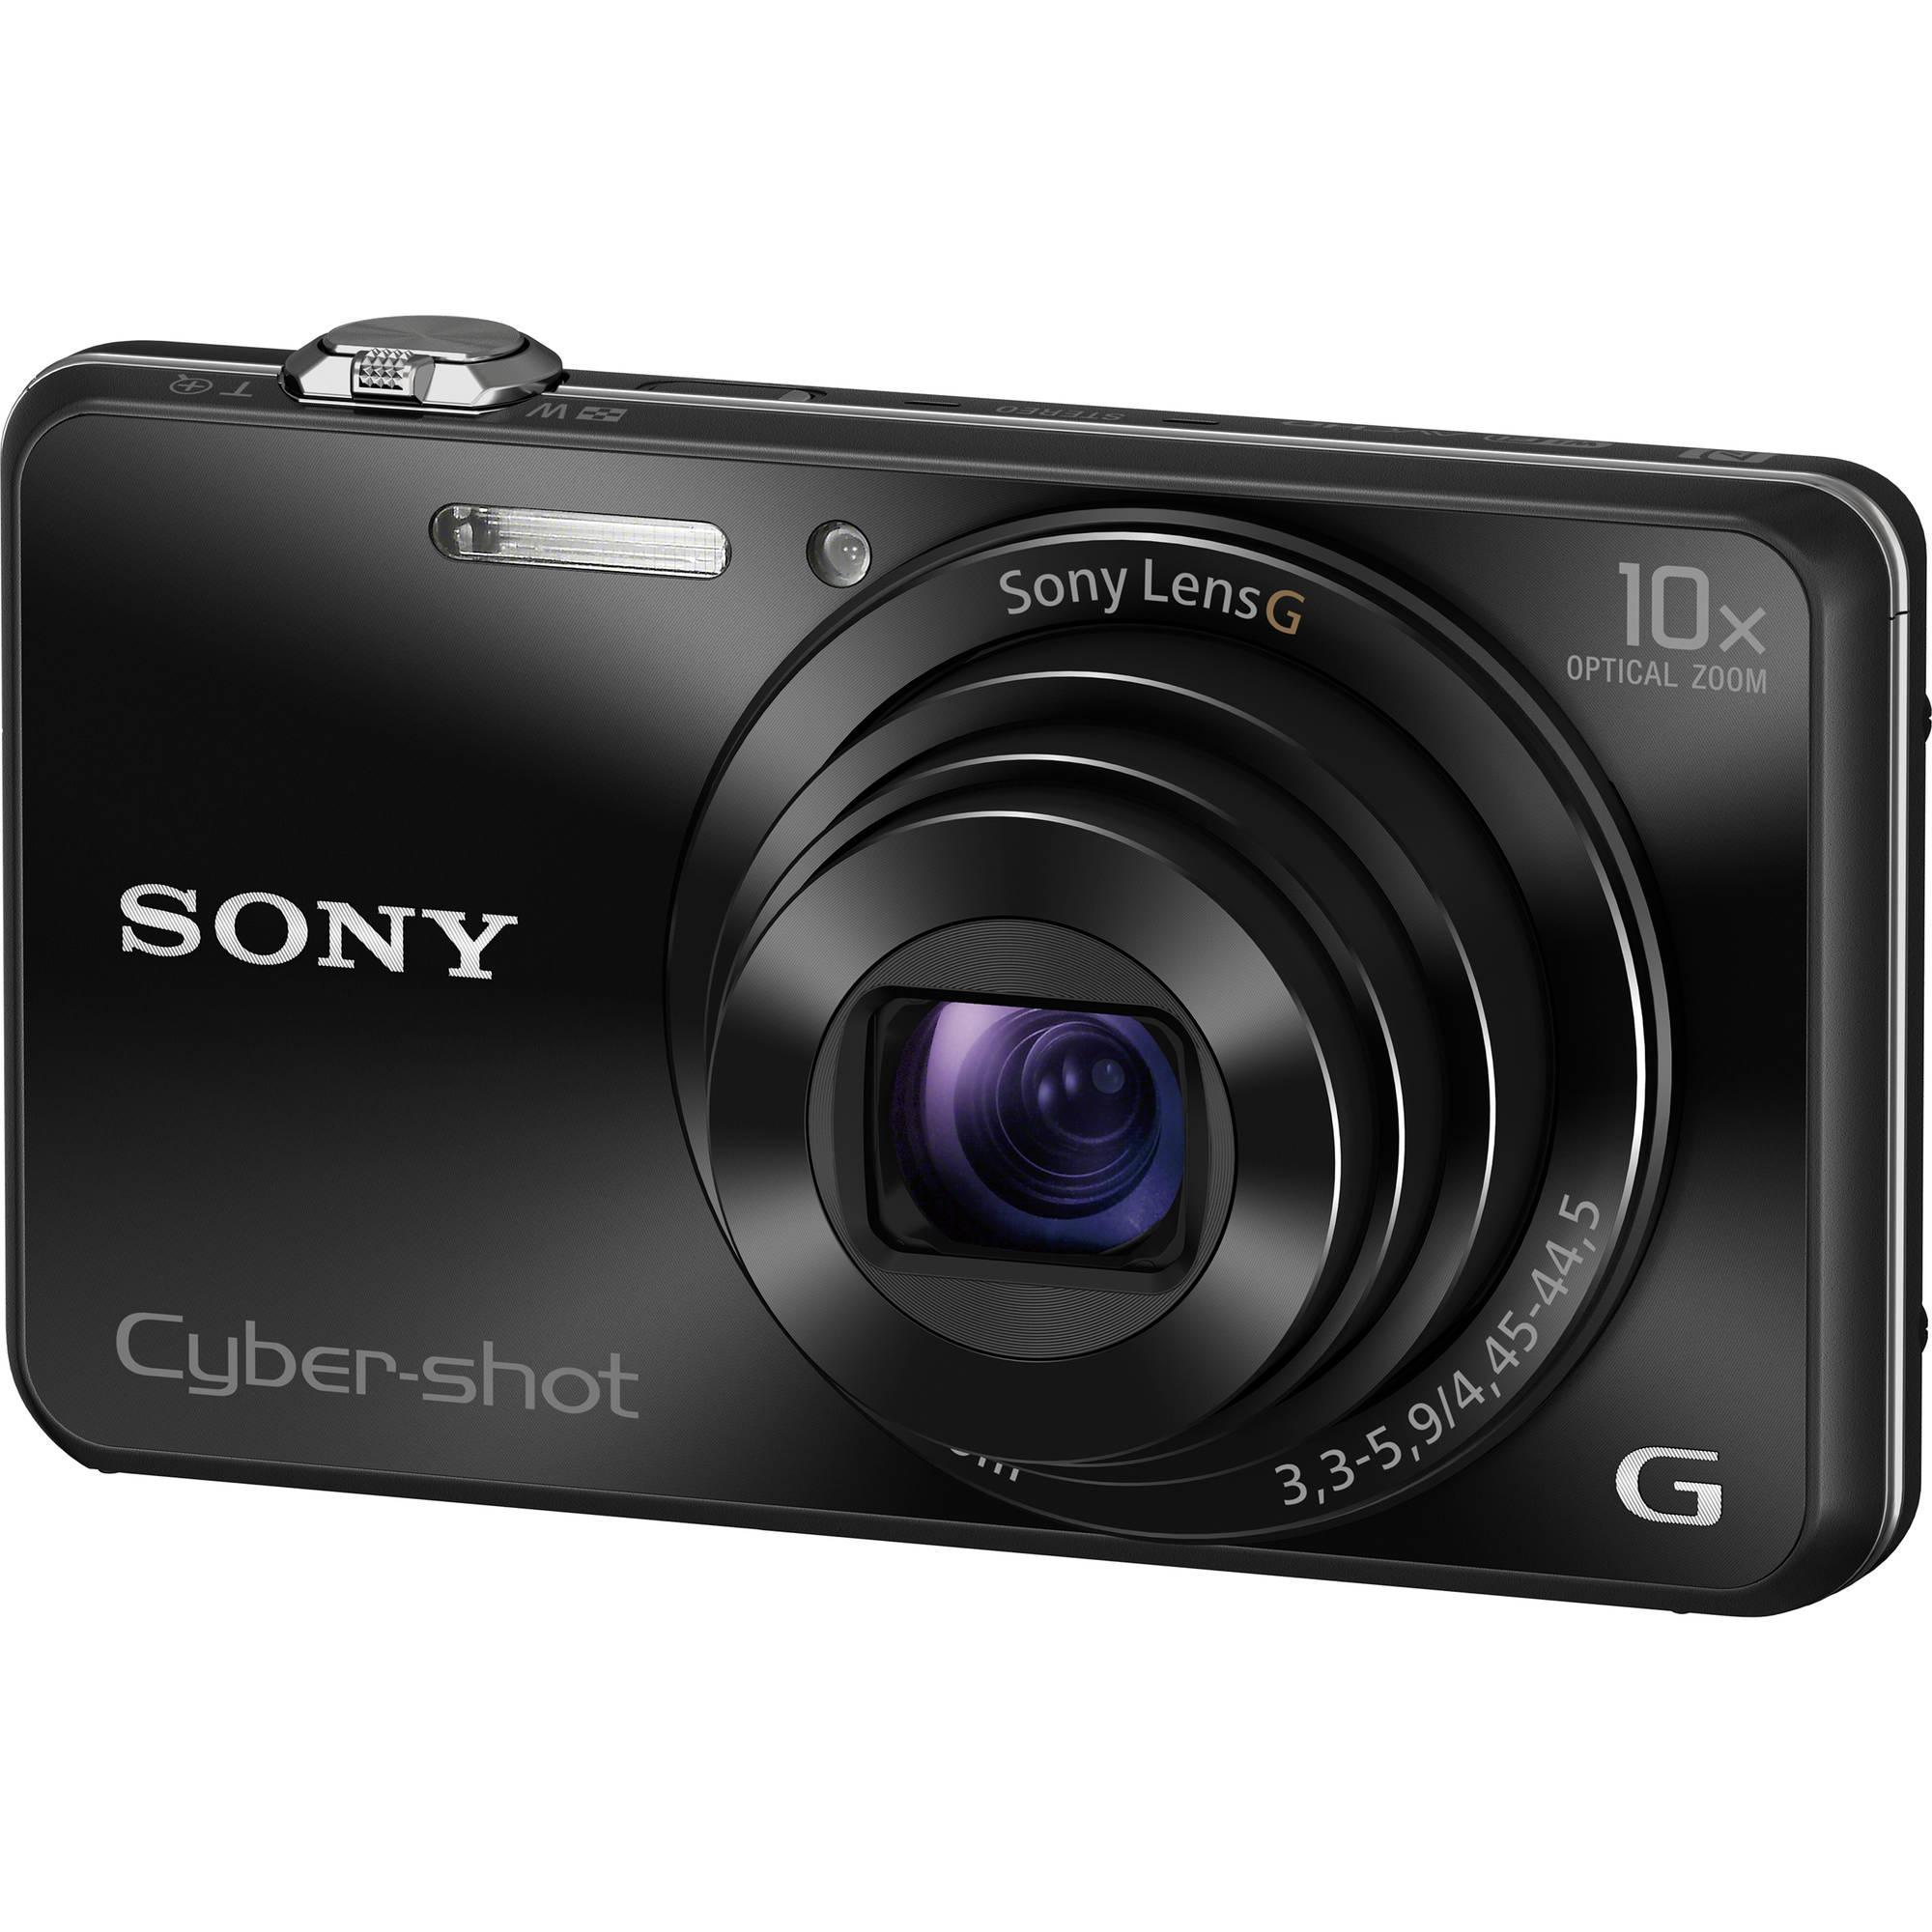 Sony Kamera WX220 dengan 10X Optikal Zoom DSC-WX220 warna Hitam Garansi resmi 1 tahun Sony Indonesia